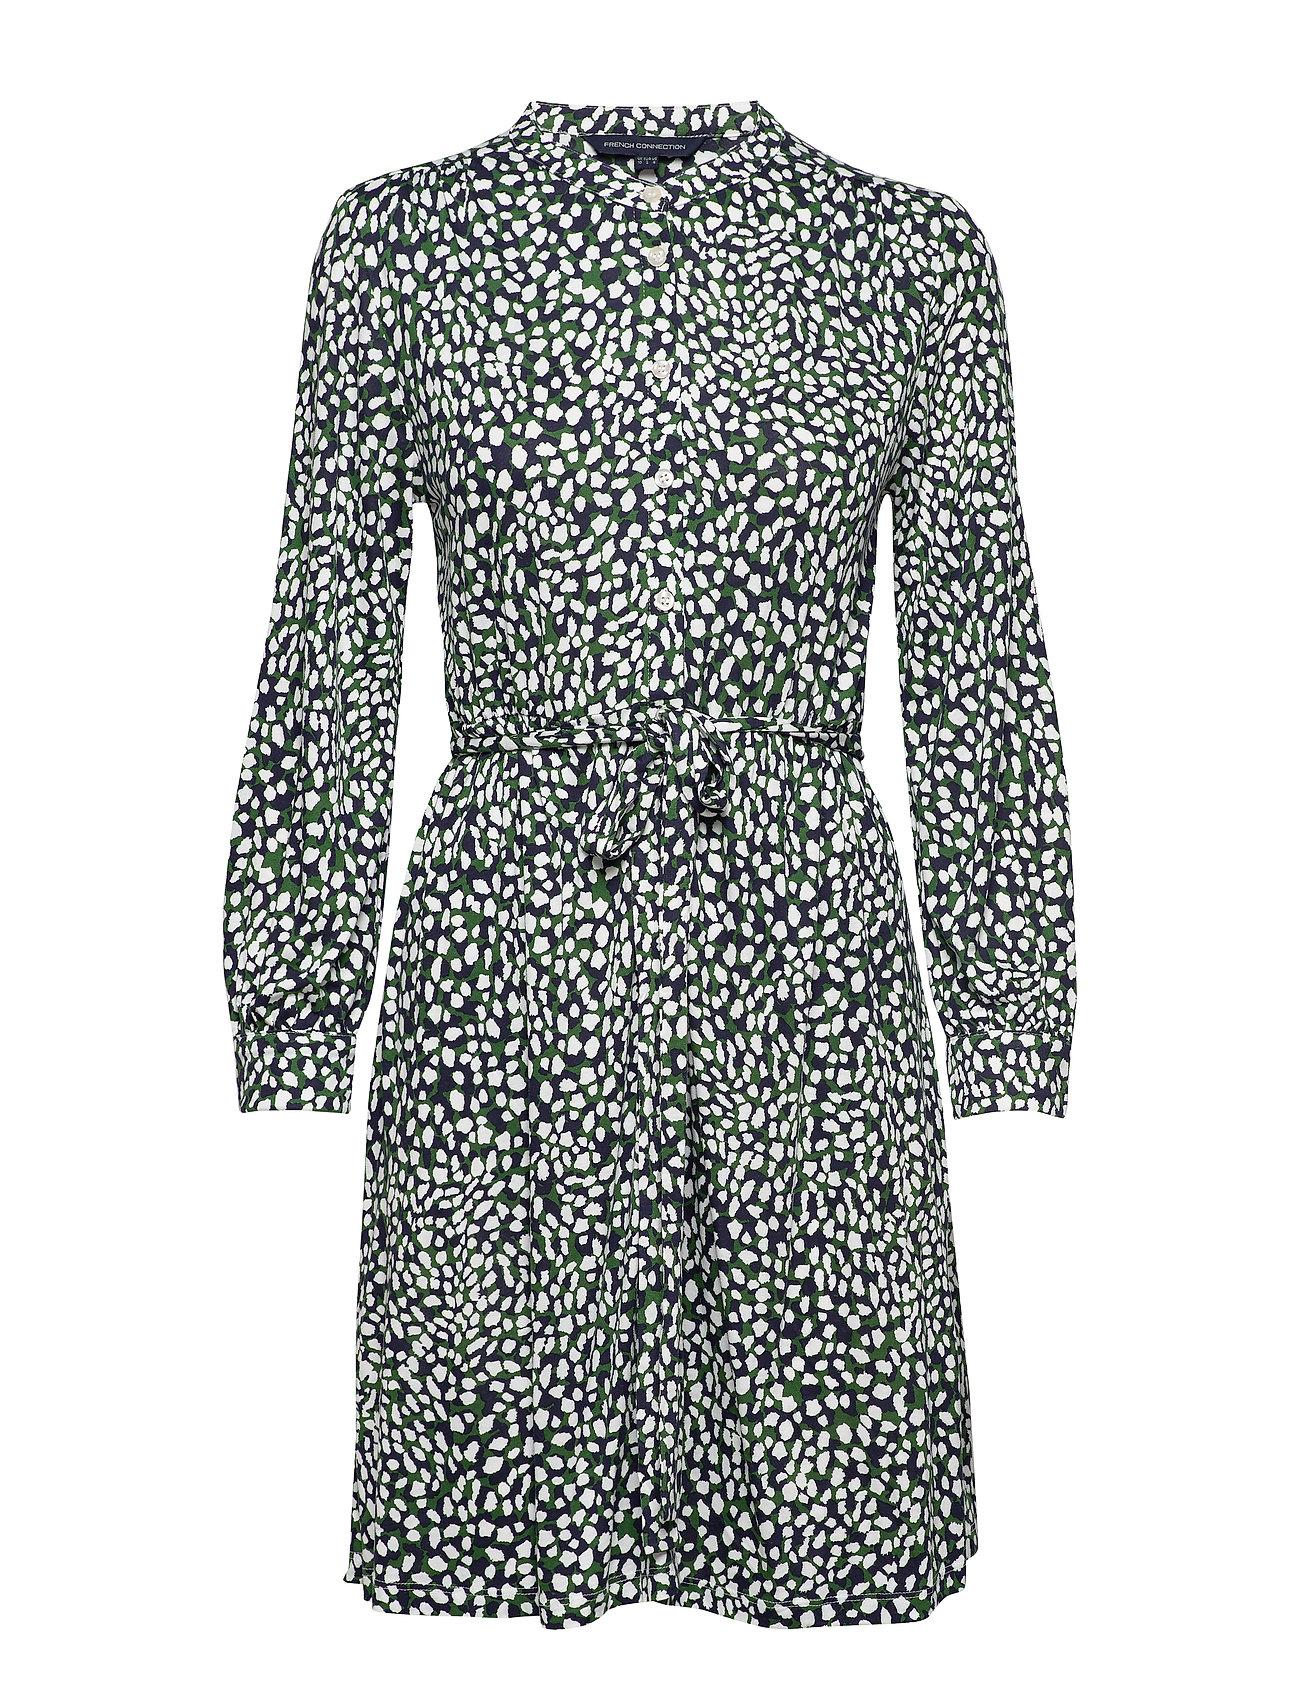 Image of Vasha Meadow Jersey Shirt Dres Knælang Kjole Multi/mønstret French Connection (3326811309)